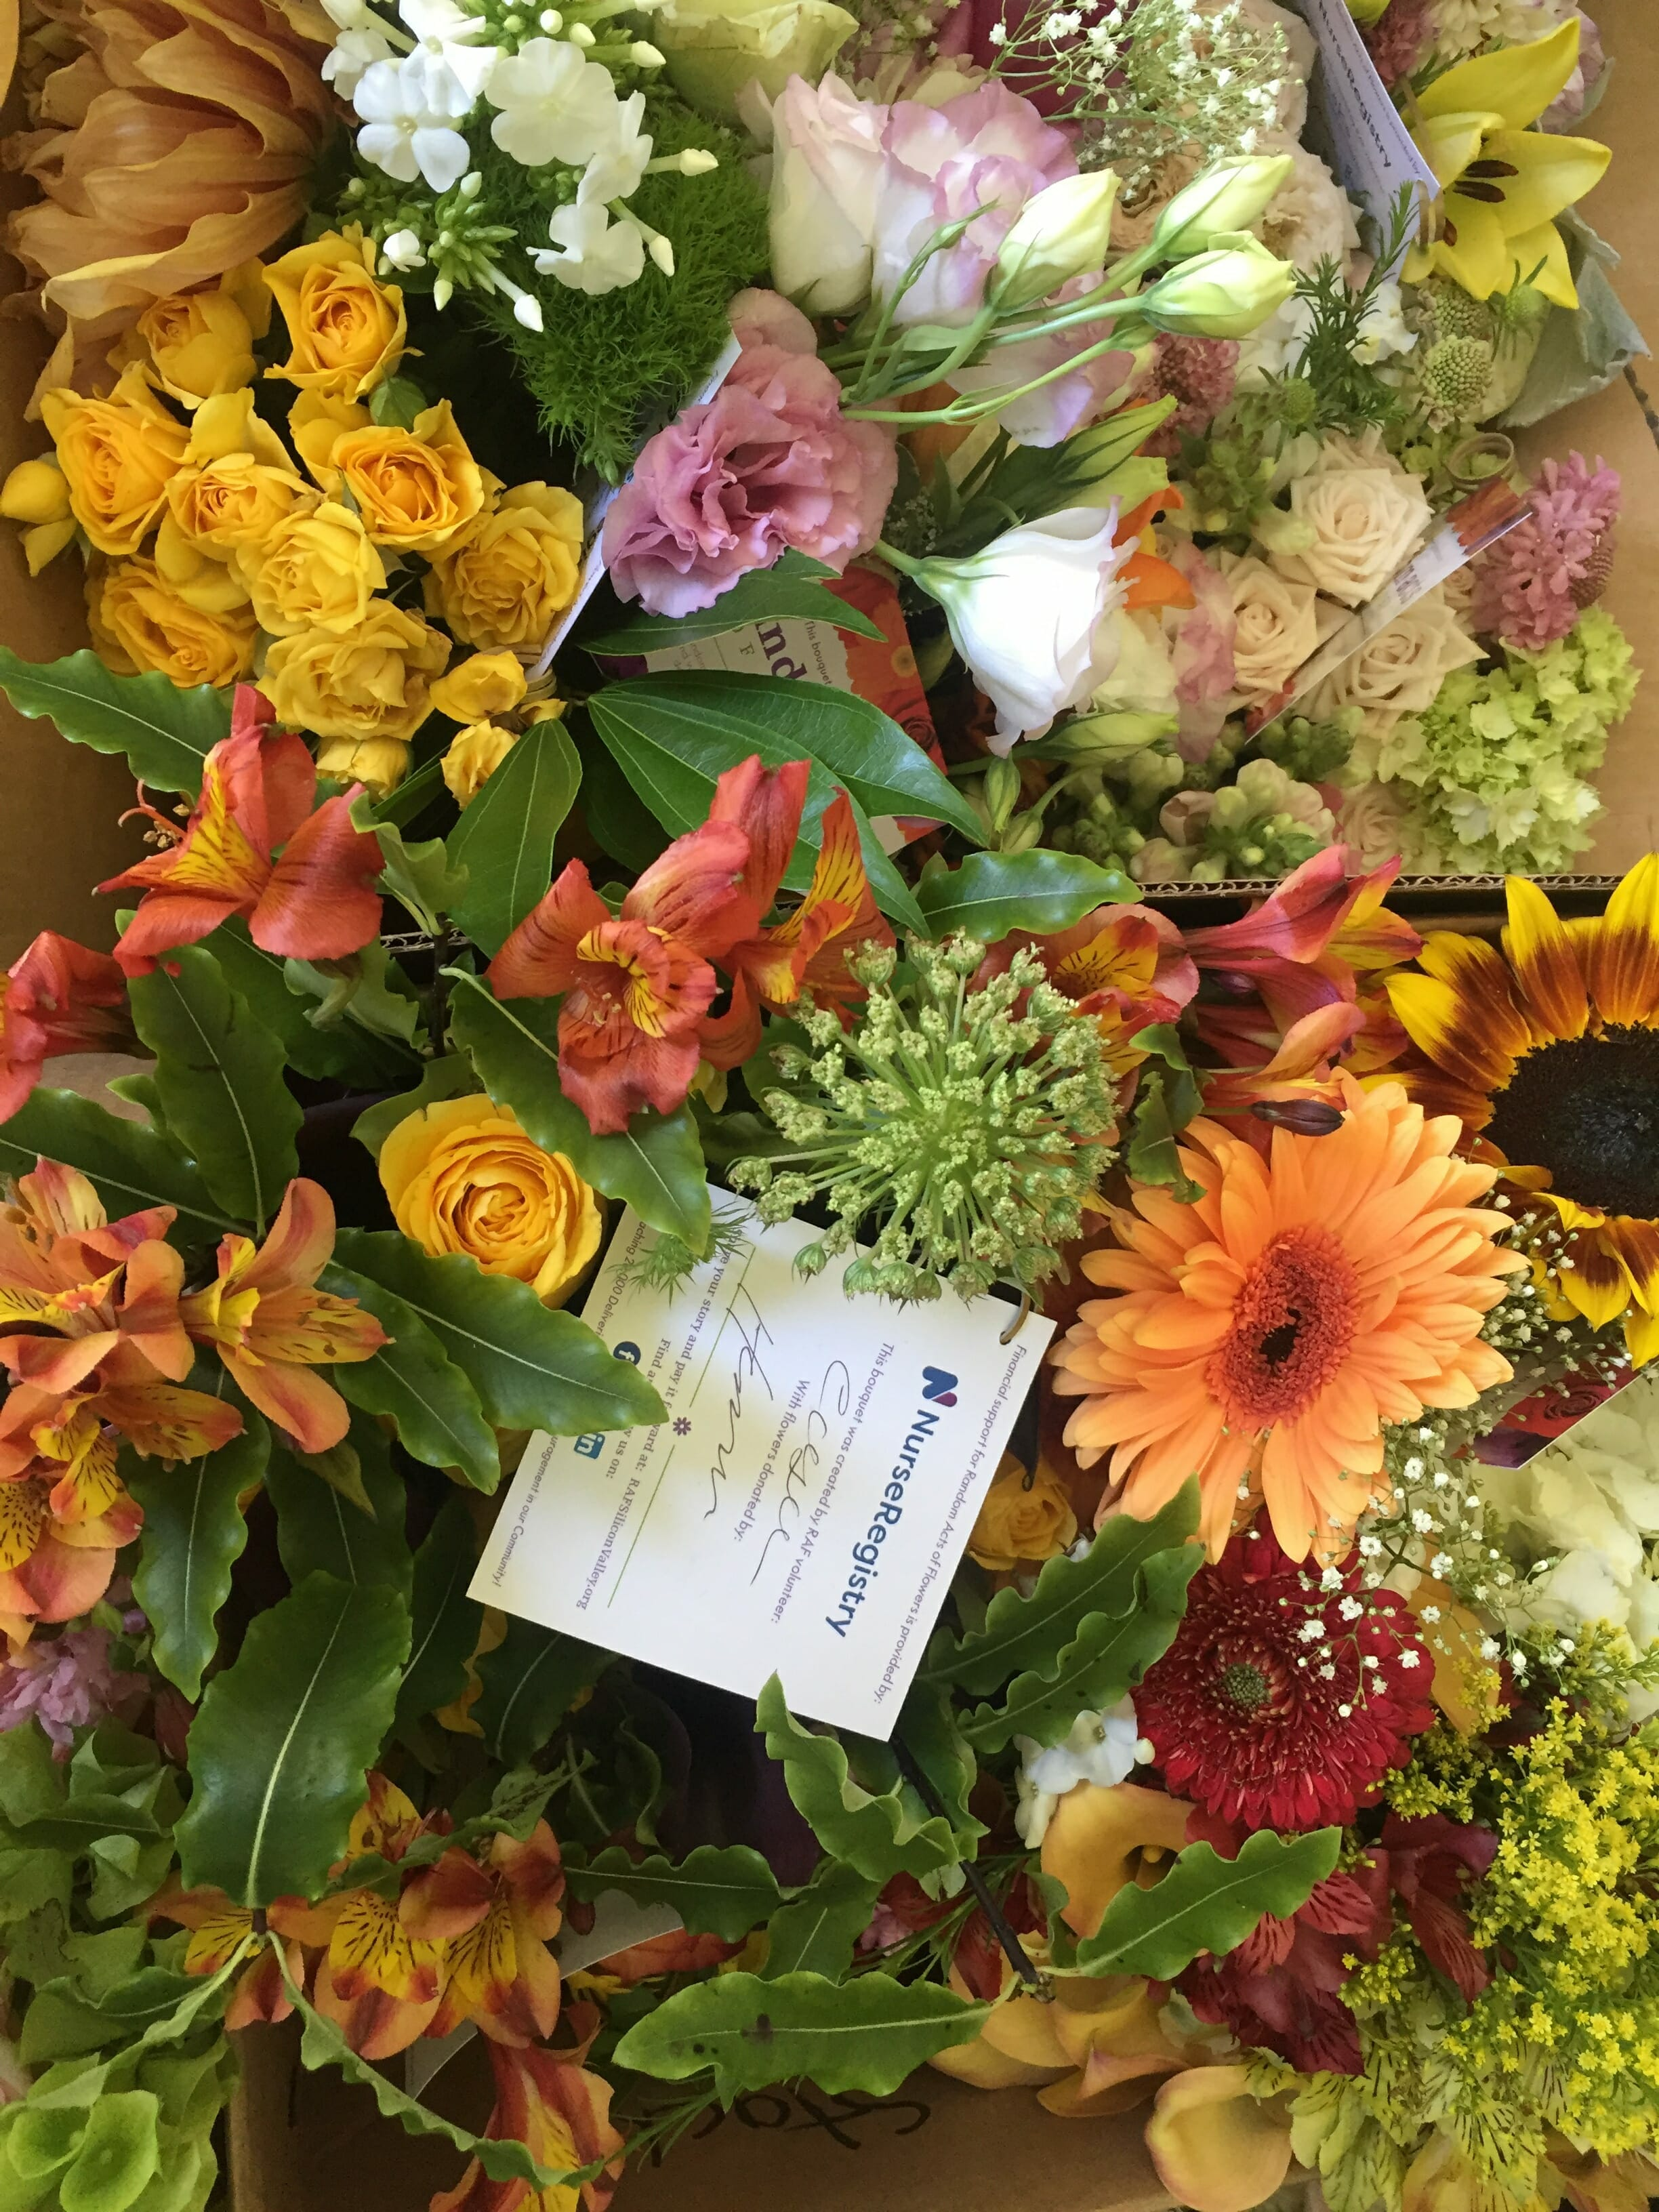 Avenidas Flower donations